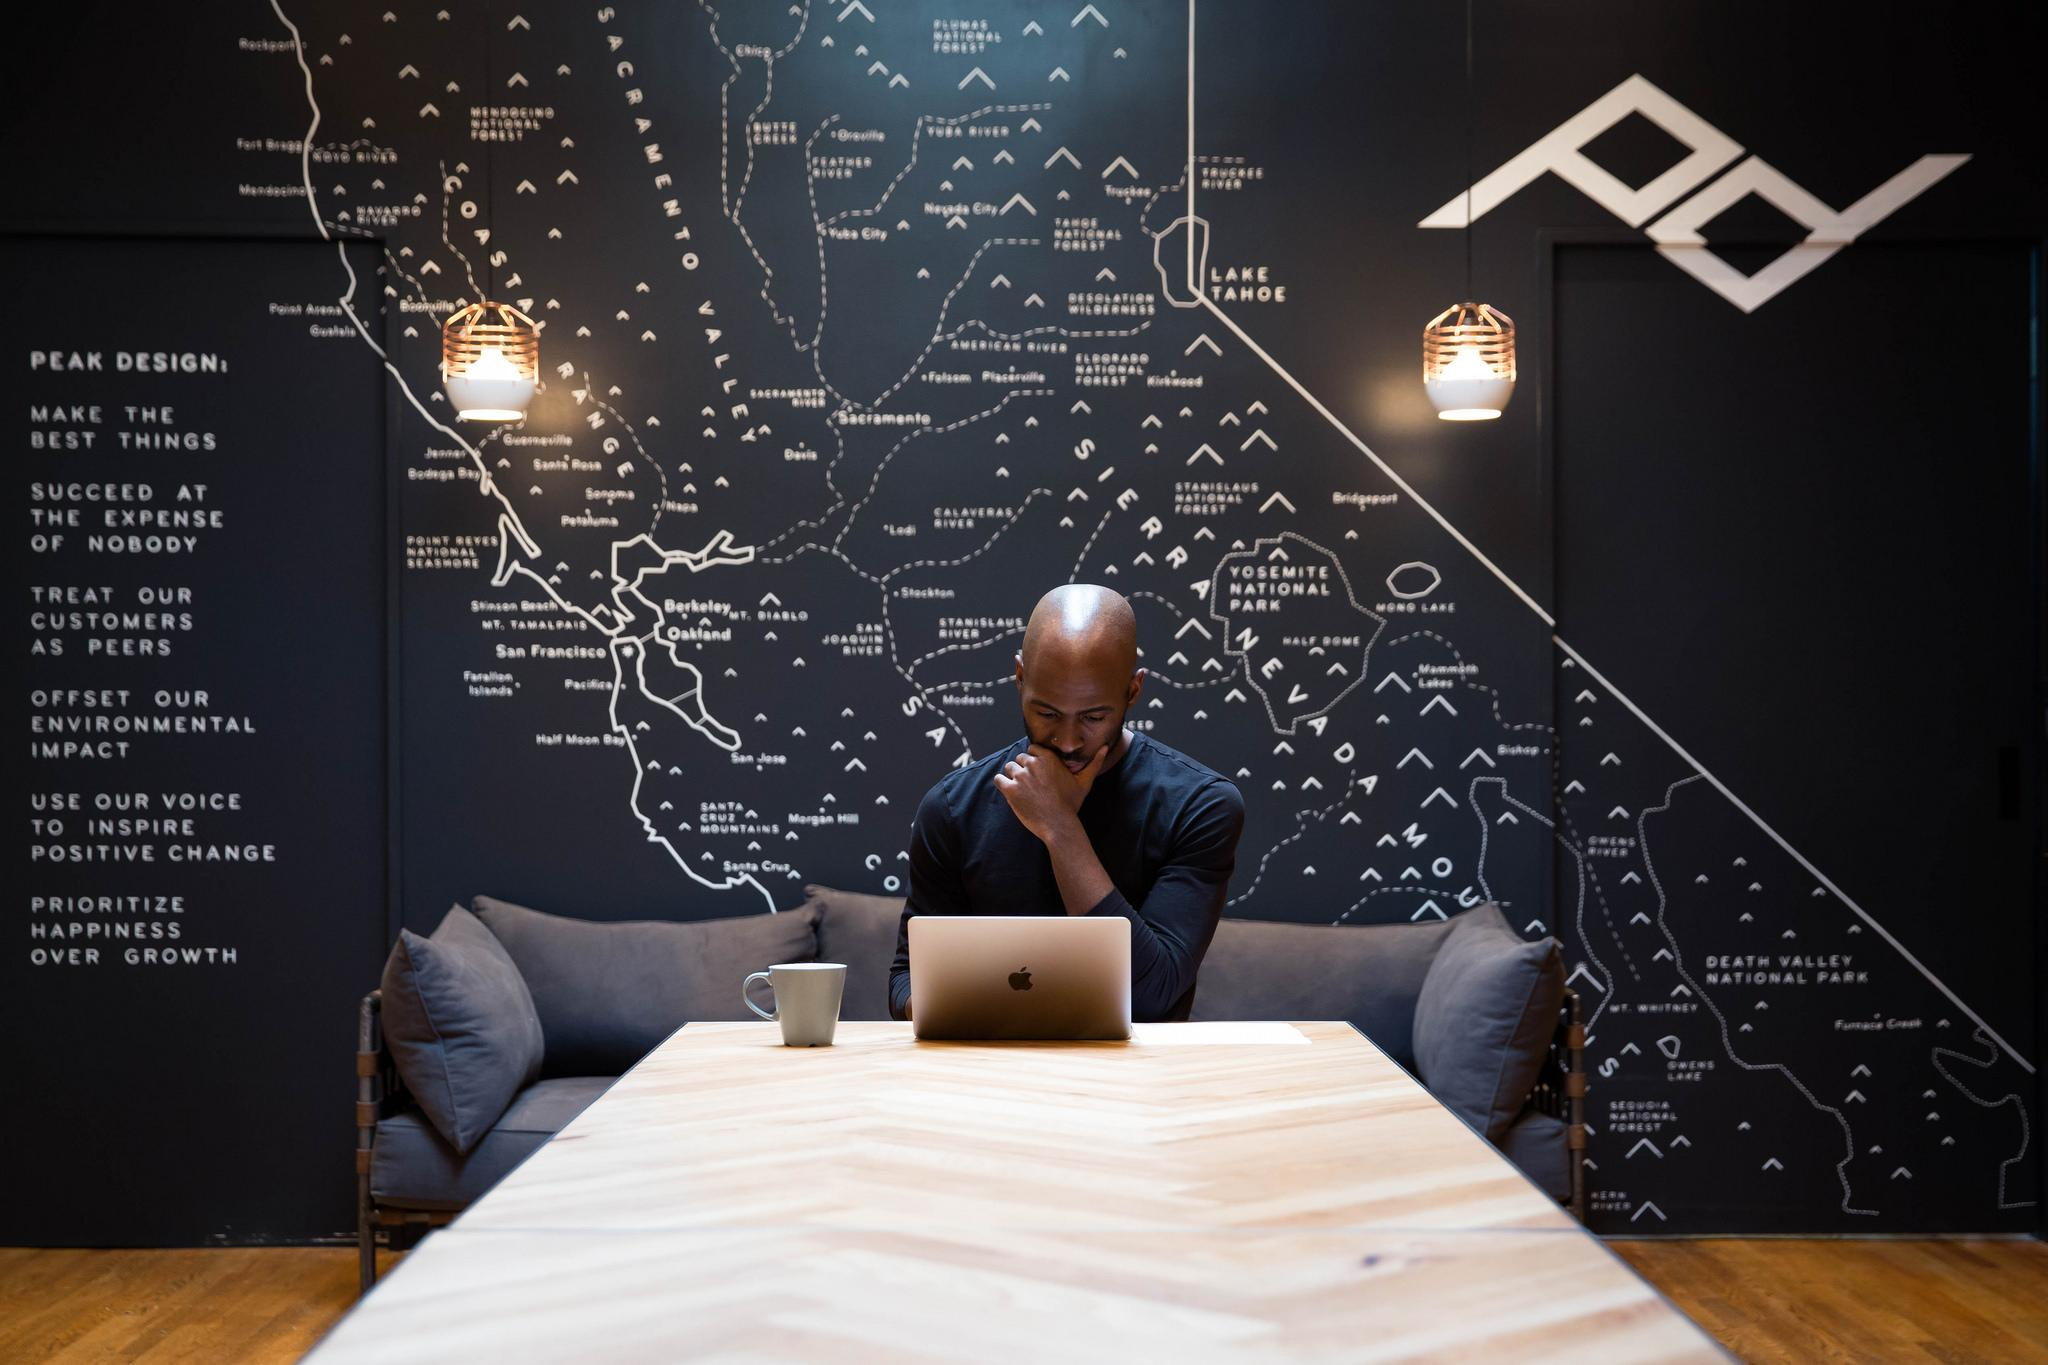 Peak Design: Co-working for Creatives